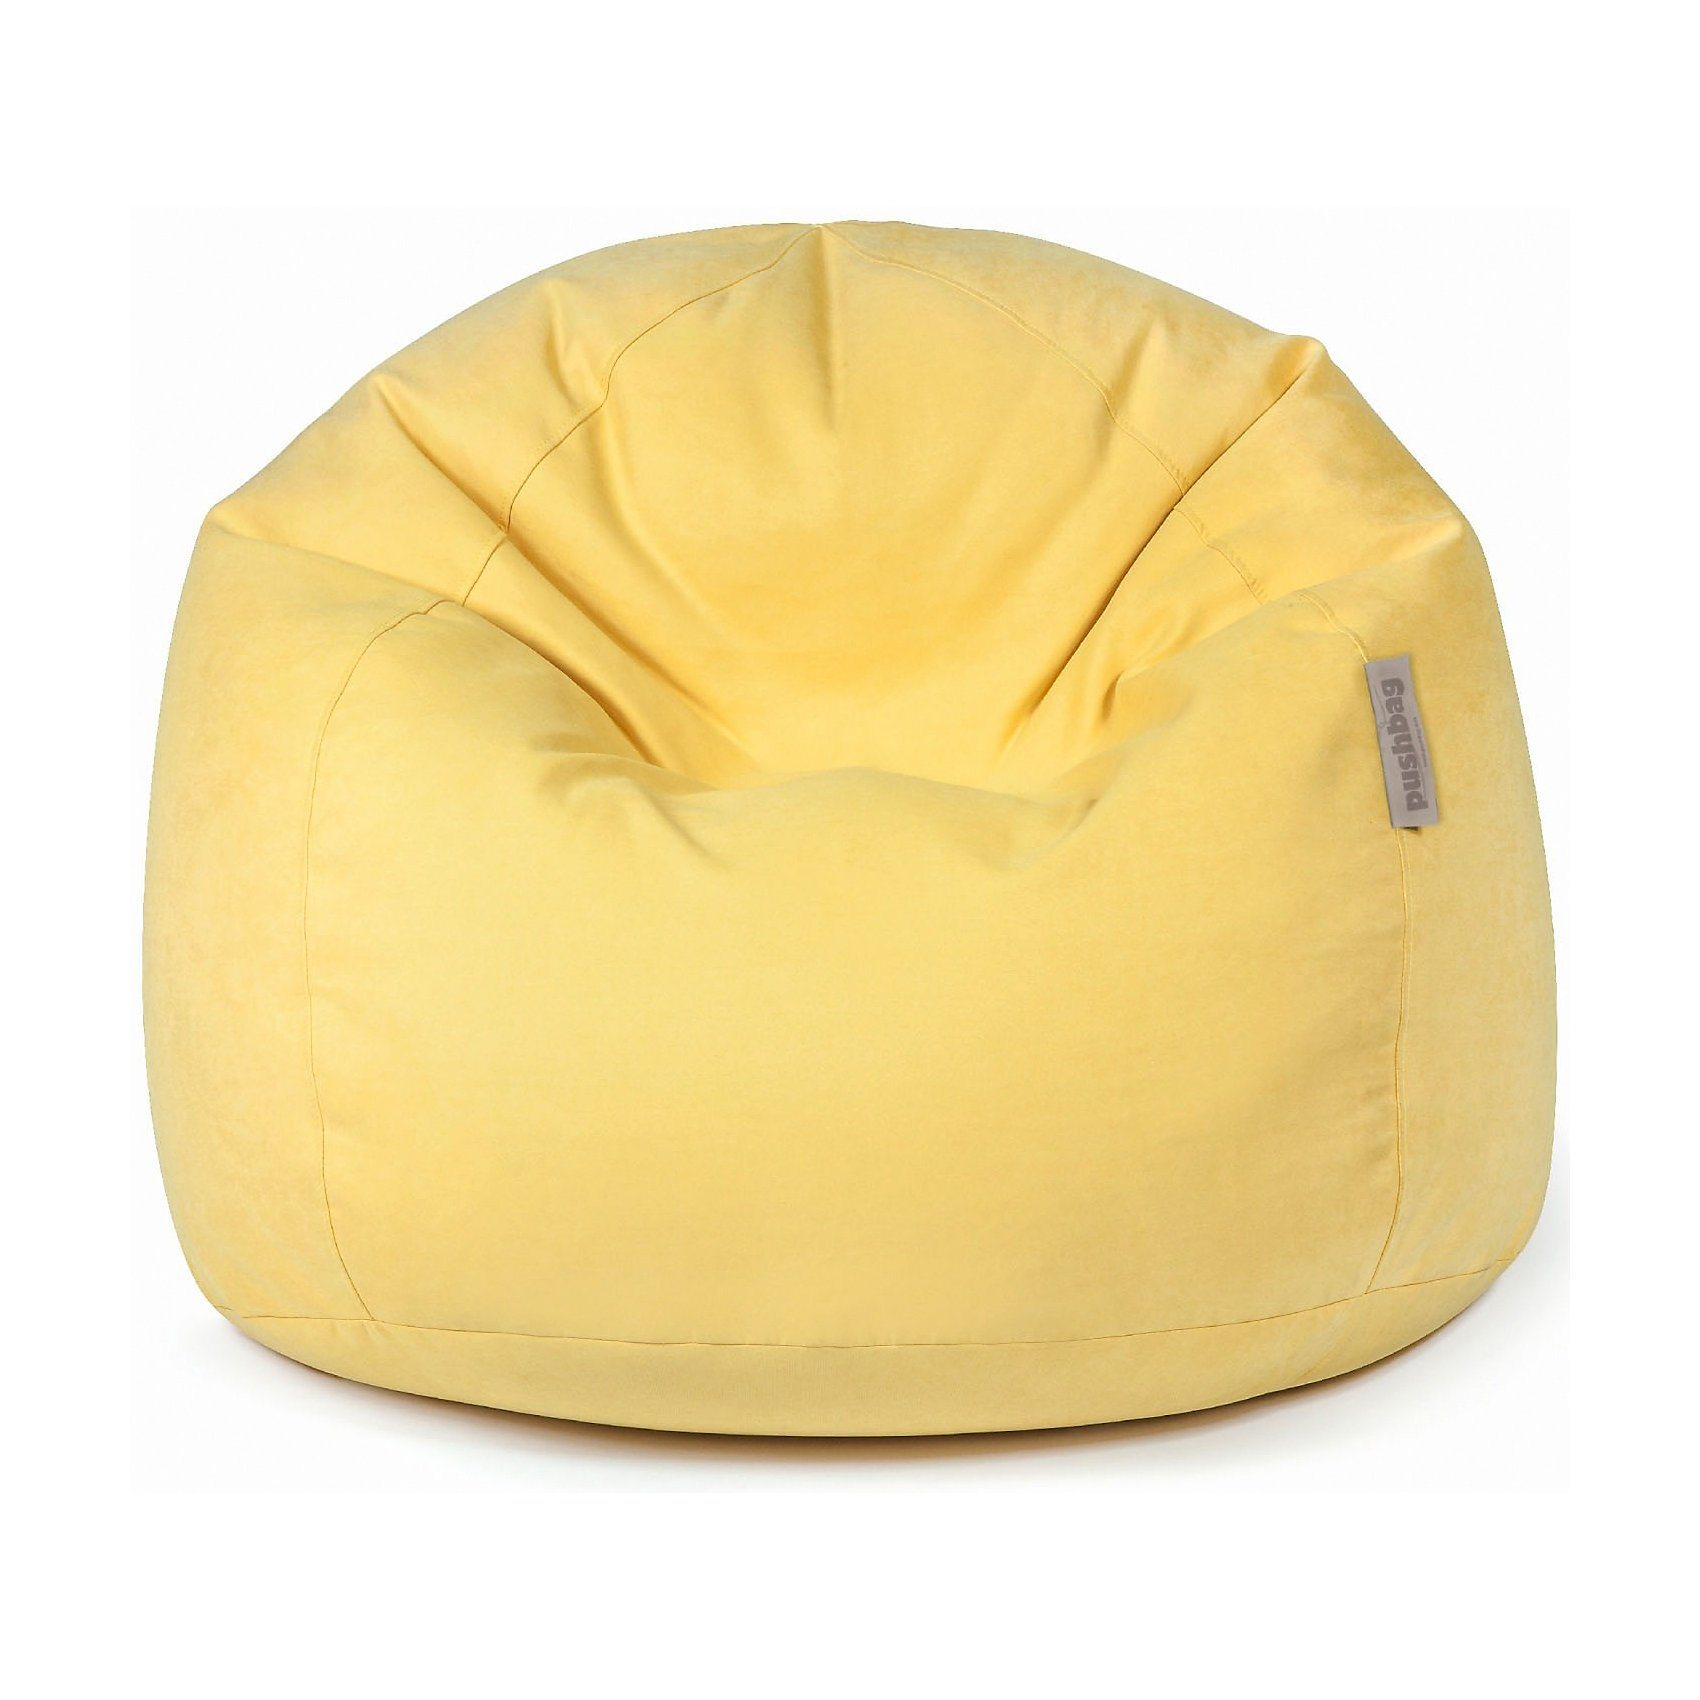 Sitzsack BAG 500, Soft, honey | Wohnzimmer > Sessel > Sitzsaecke | Polyester - Baumwolle